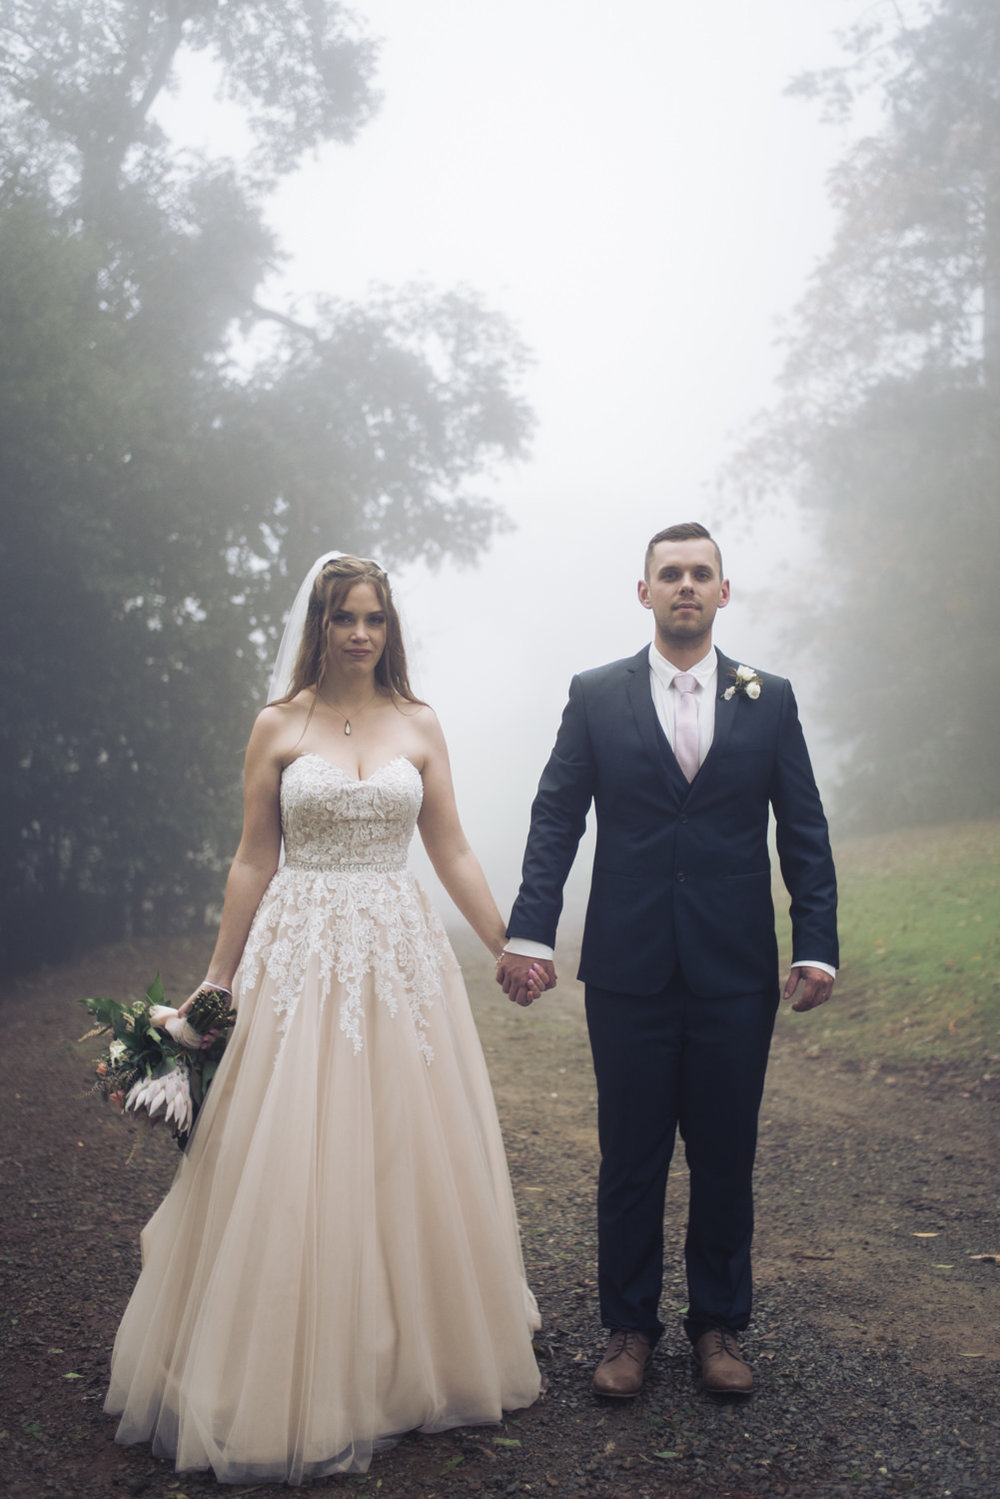 Mt-tamborine-wedding-st-bernards-81.jpg